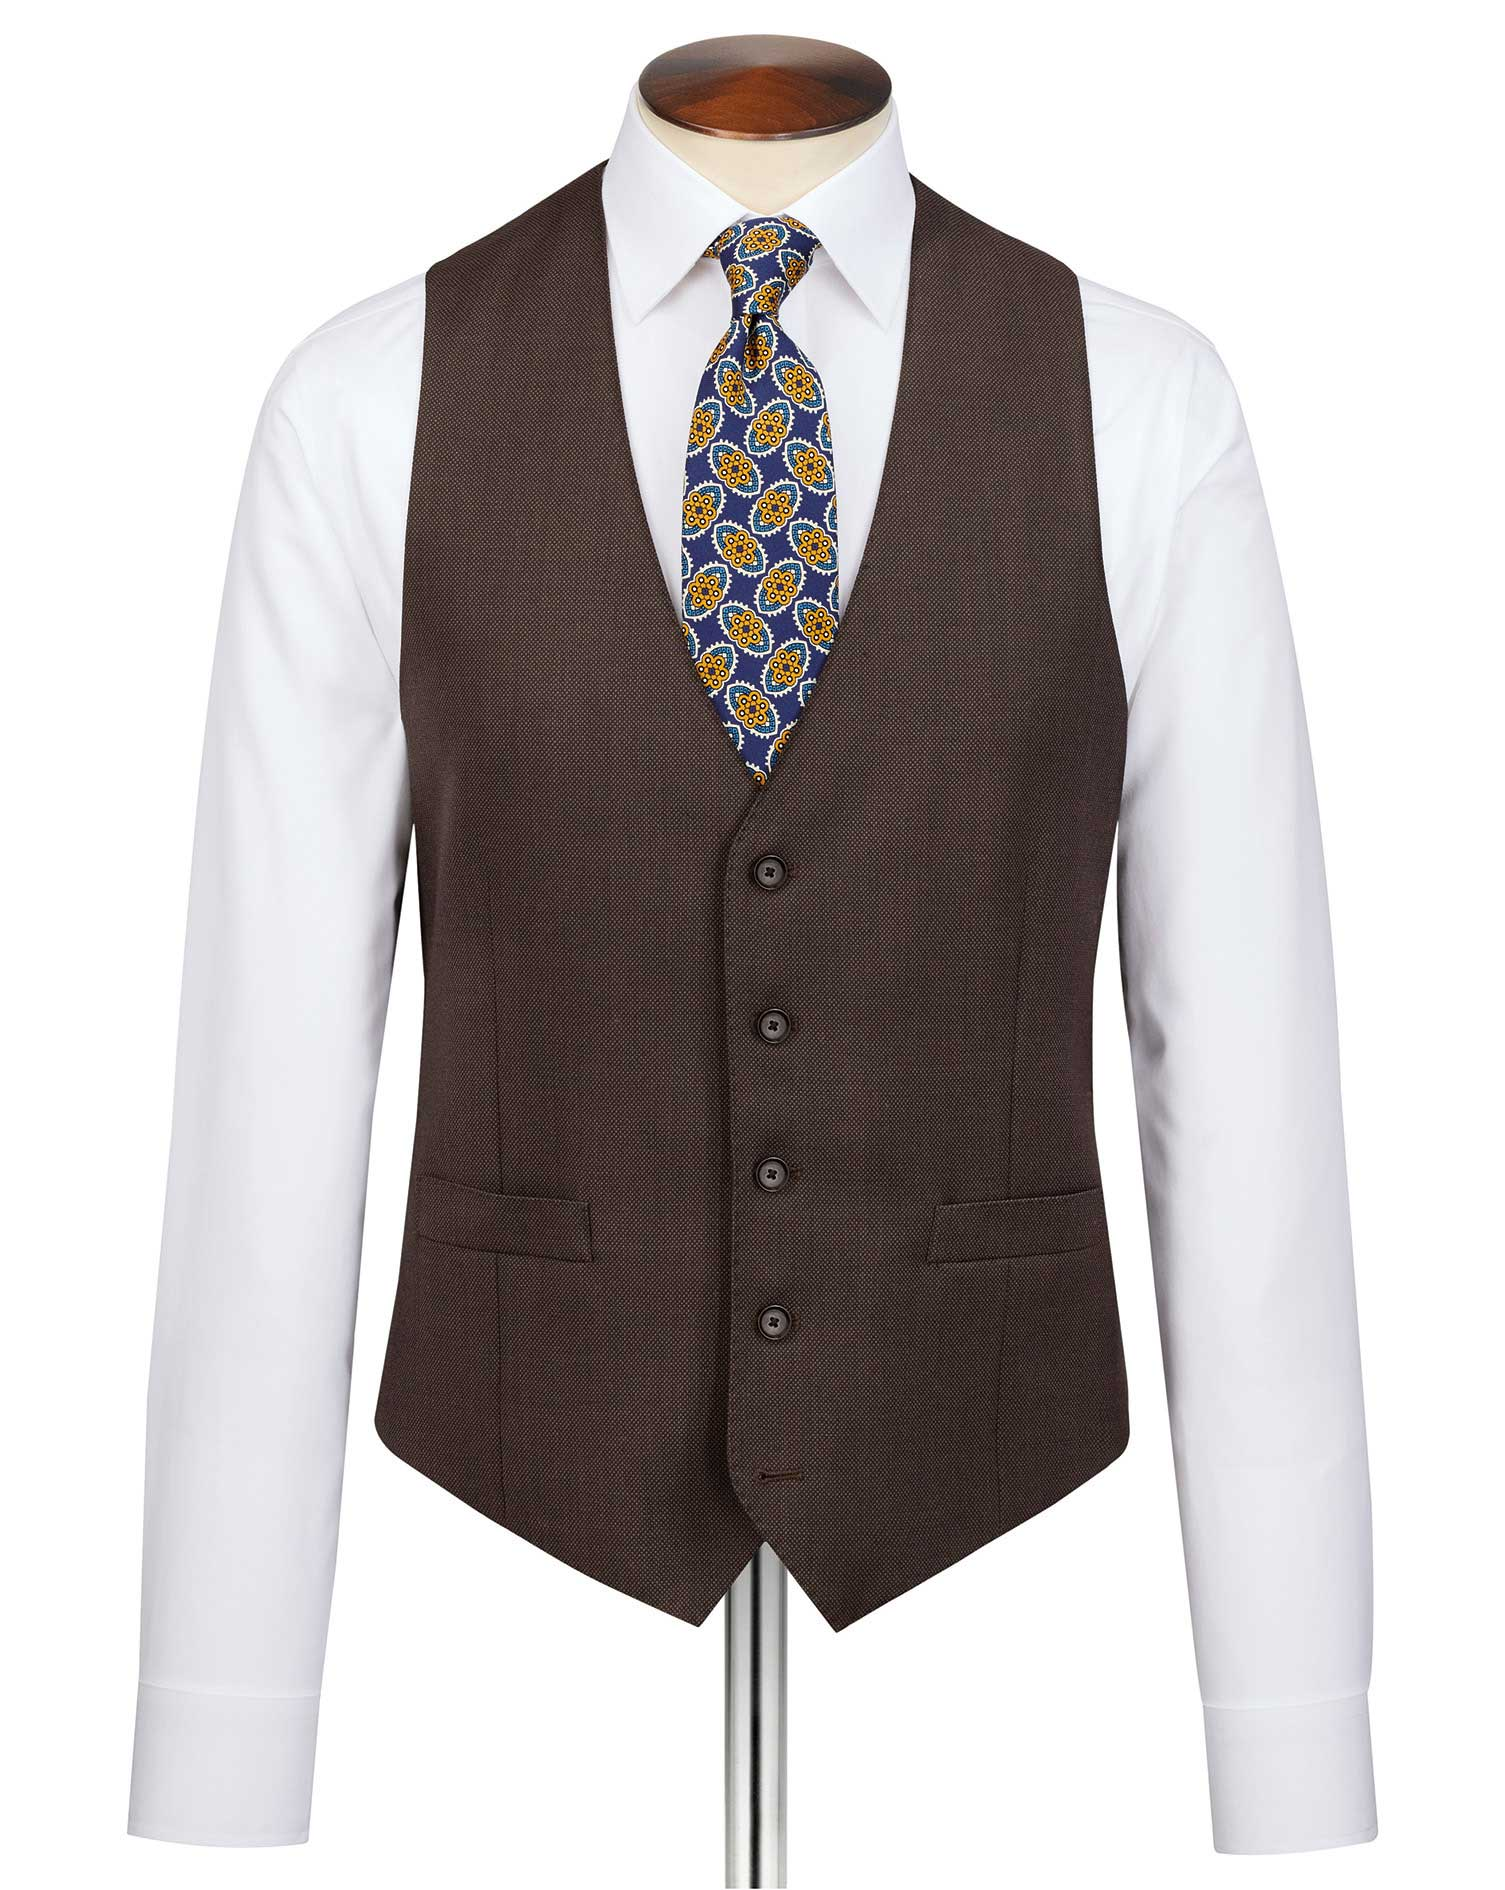 Brown Slim Fit Birdseye Travel Suit Wool Waistcoat Size w40 by Charles Tyrwhitt